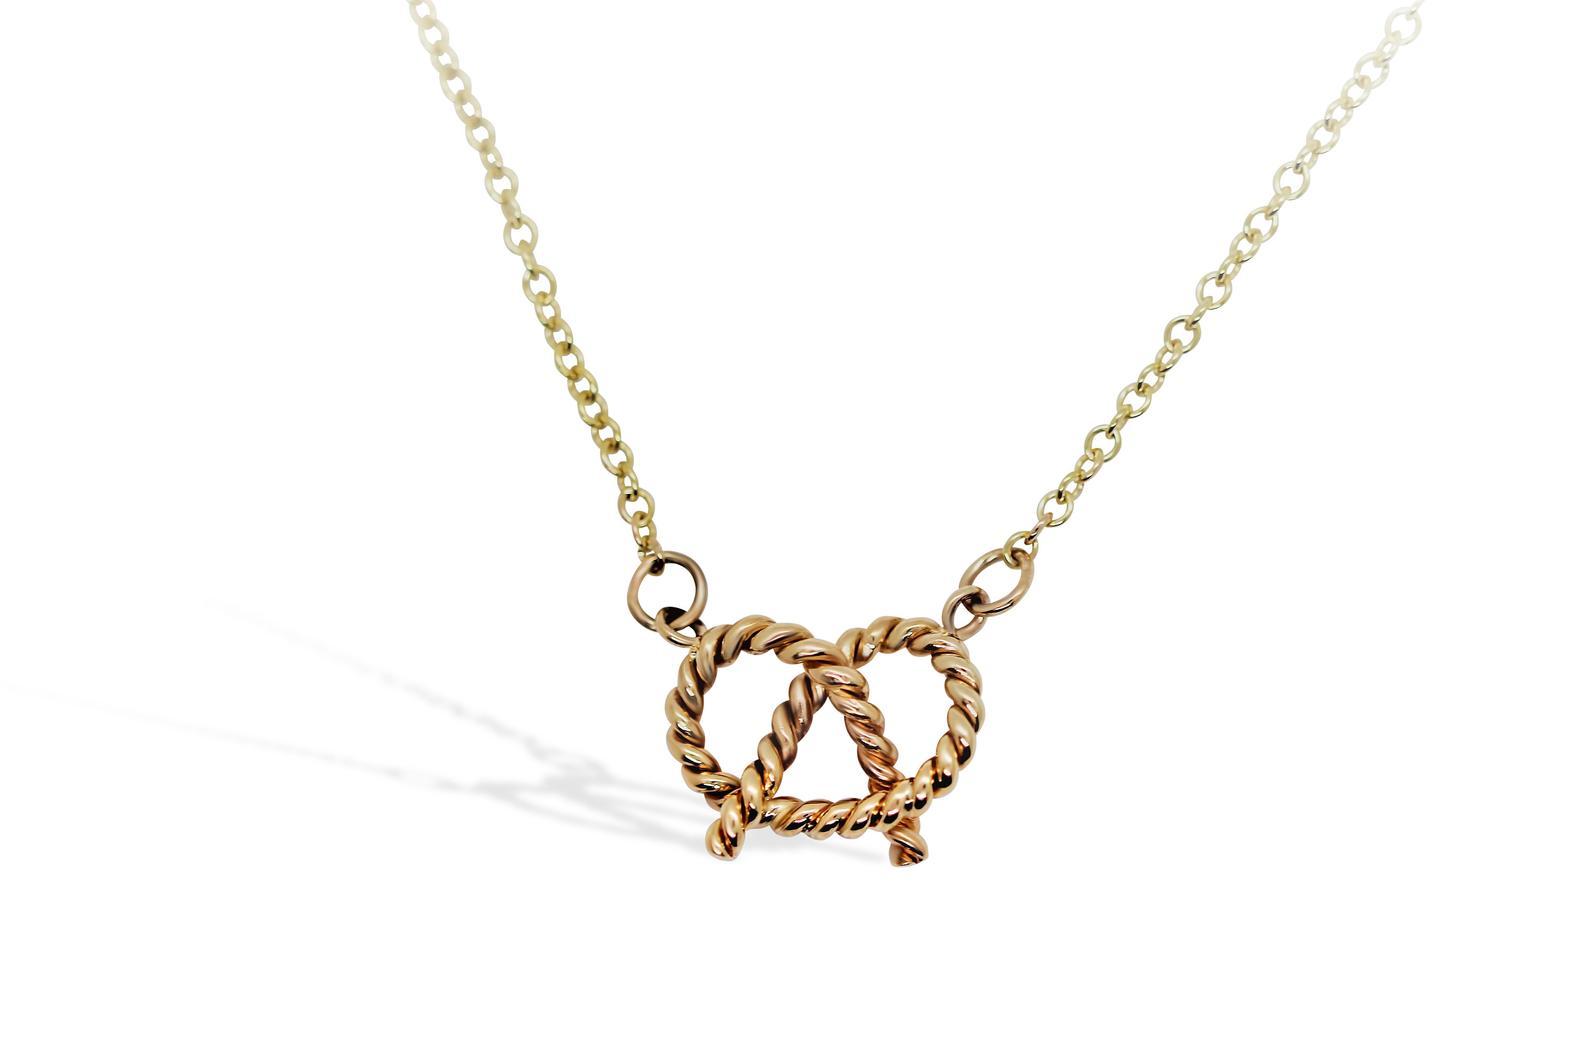 Verno Jewellery Rope necklace